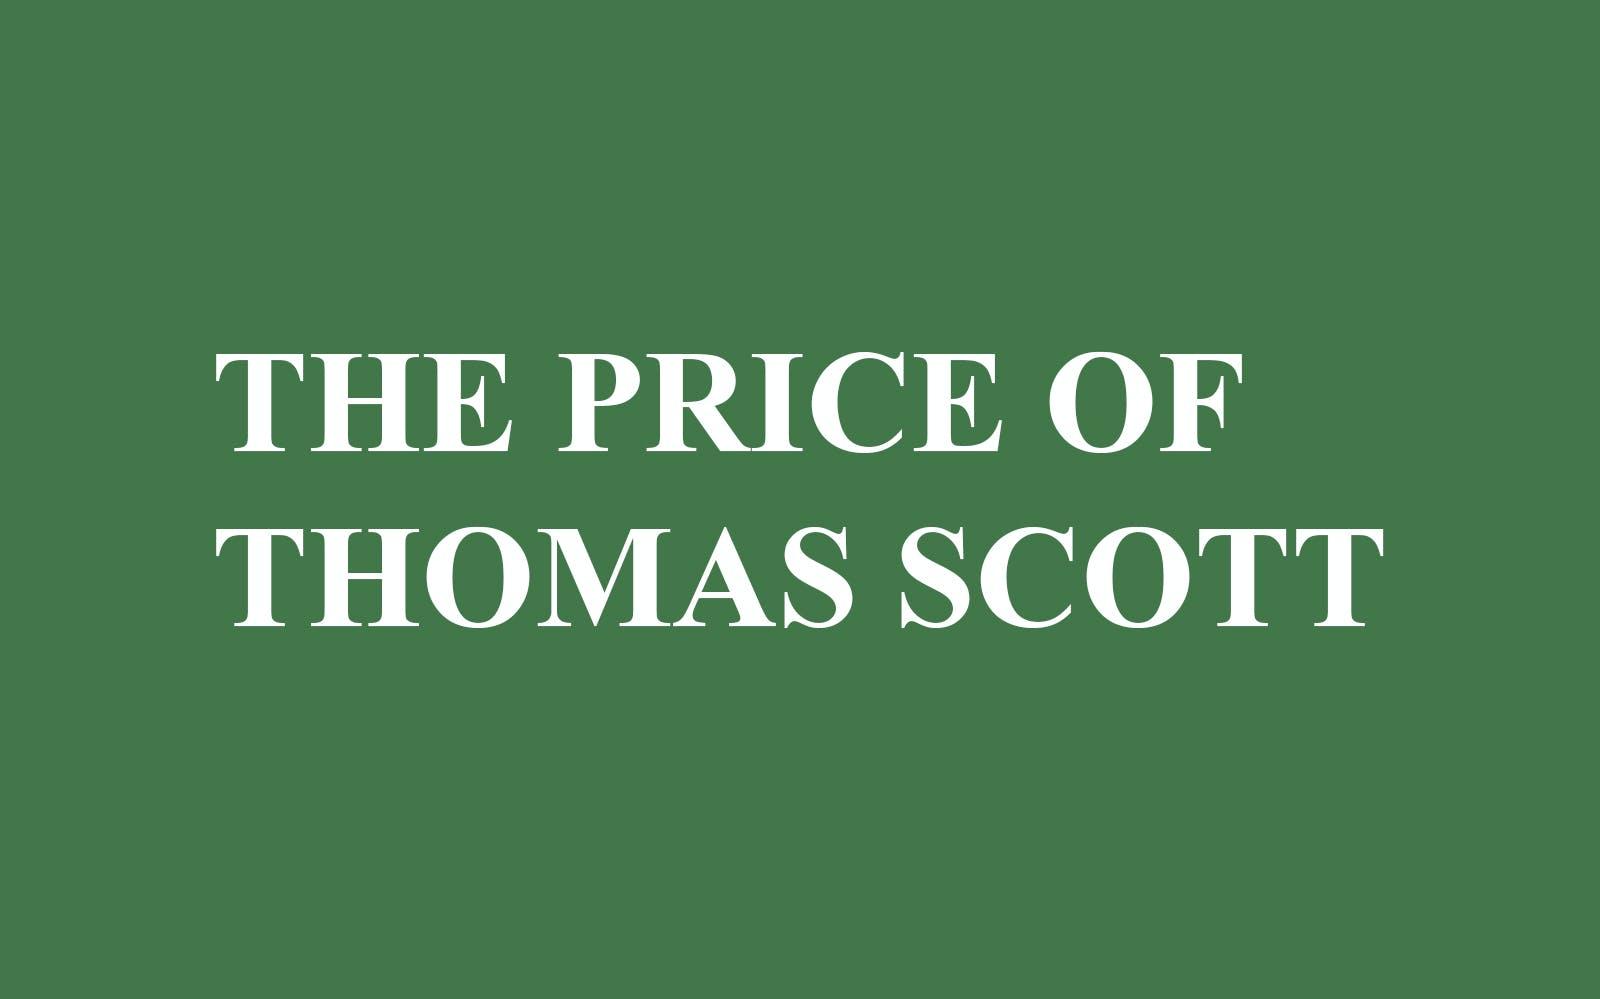 Price of Thomas Scott